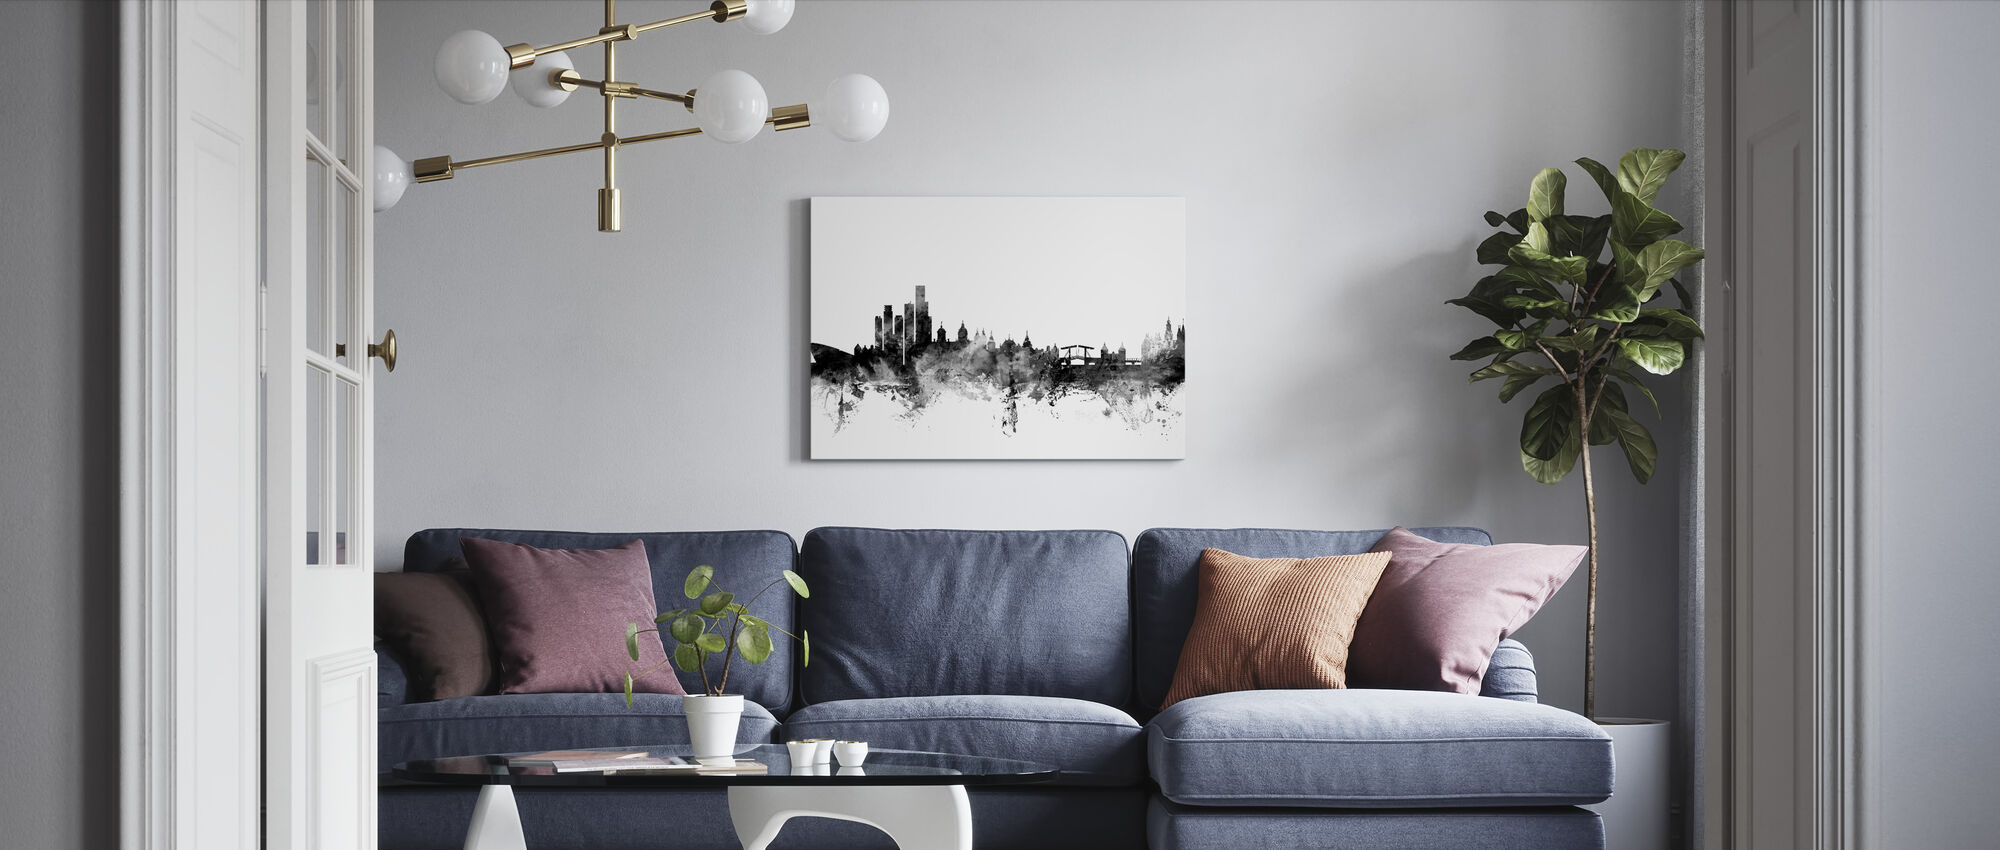 Amsterdam Skyline Black - Canvas print - Living Room